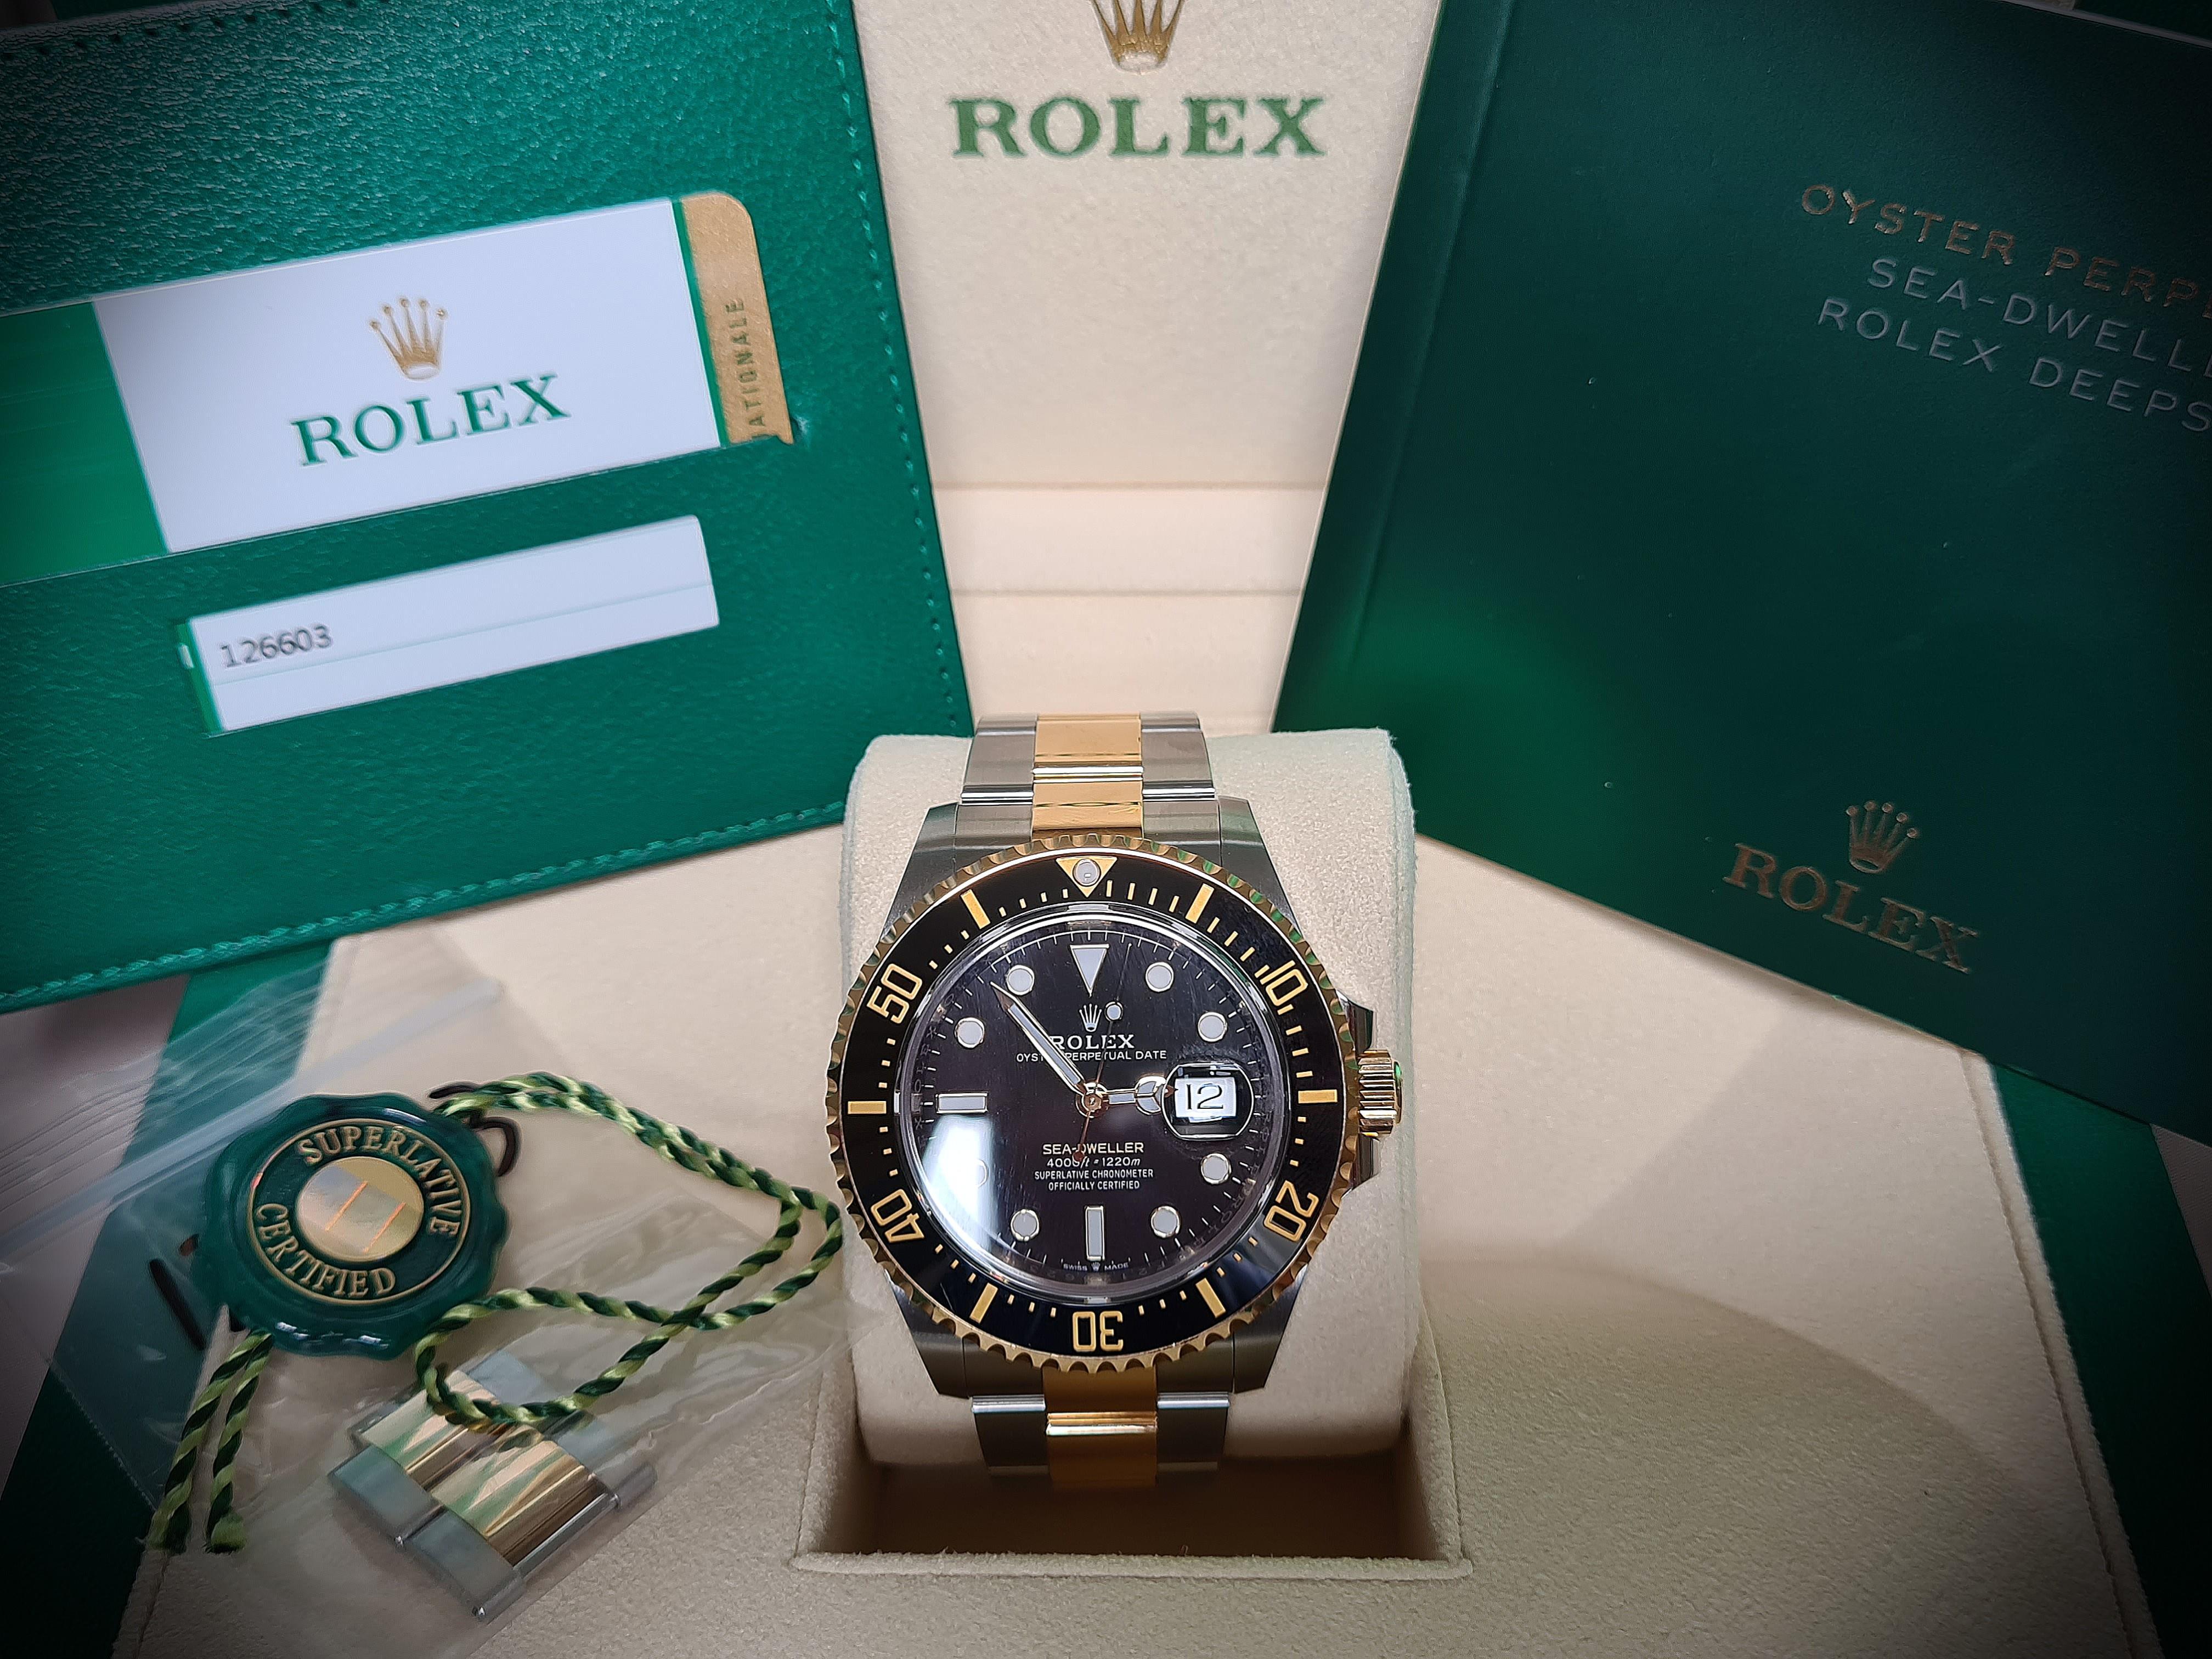 Rolex sea dweller 126603